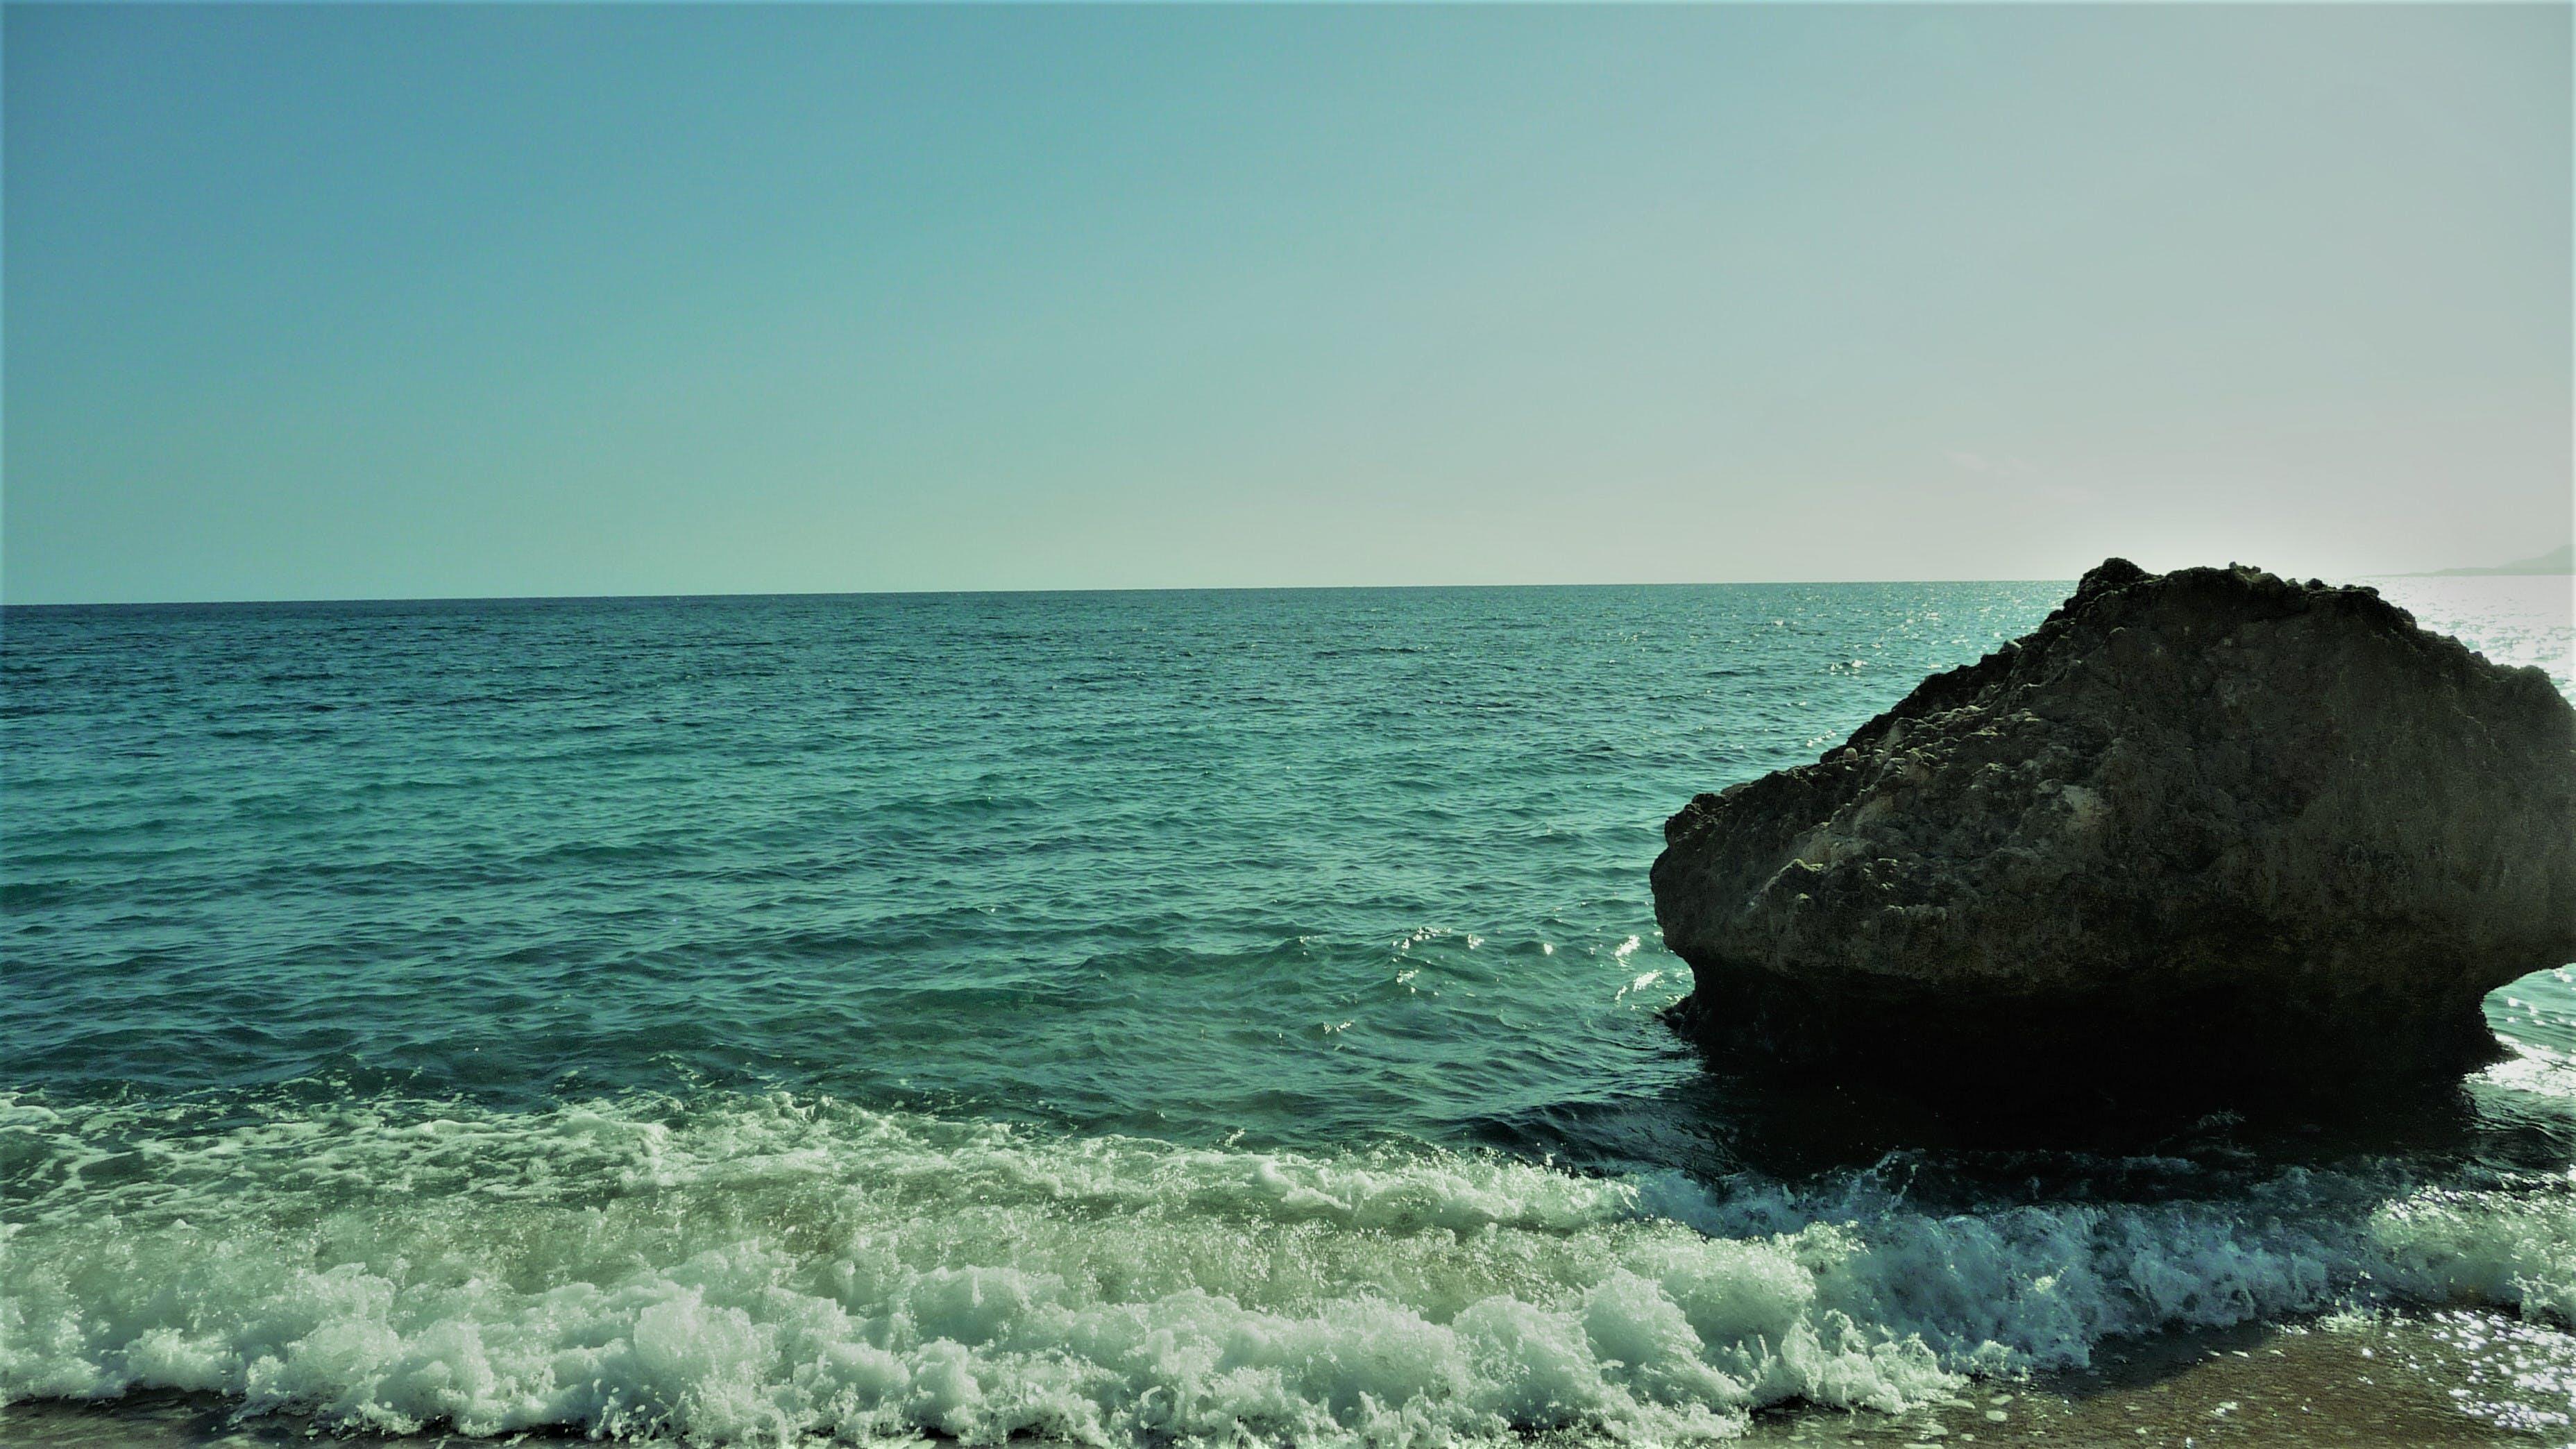 Gratis lagerfoto af Caribien, girl scout beach, guantanamo bay, hav